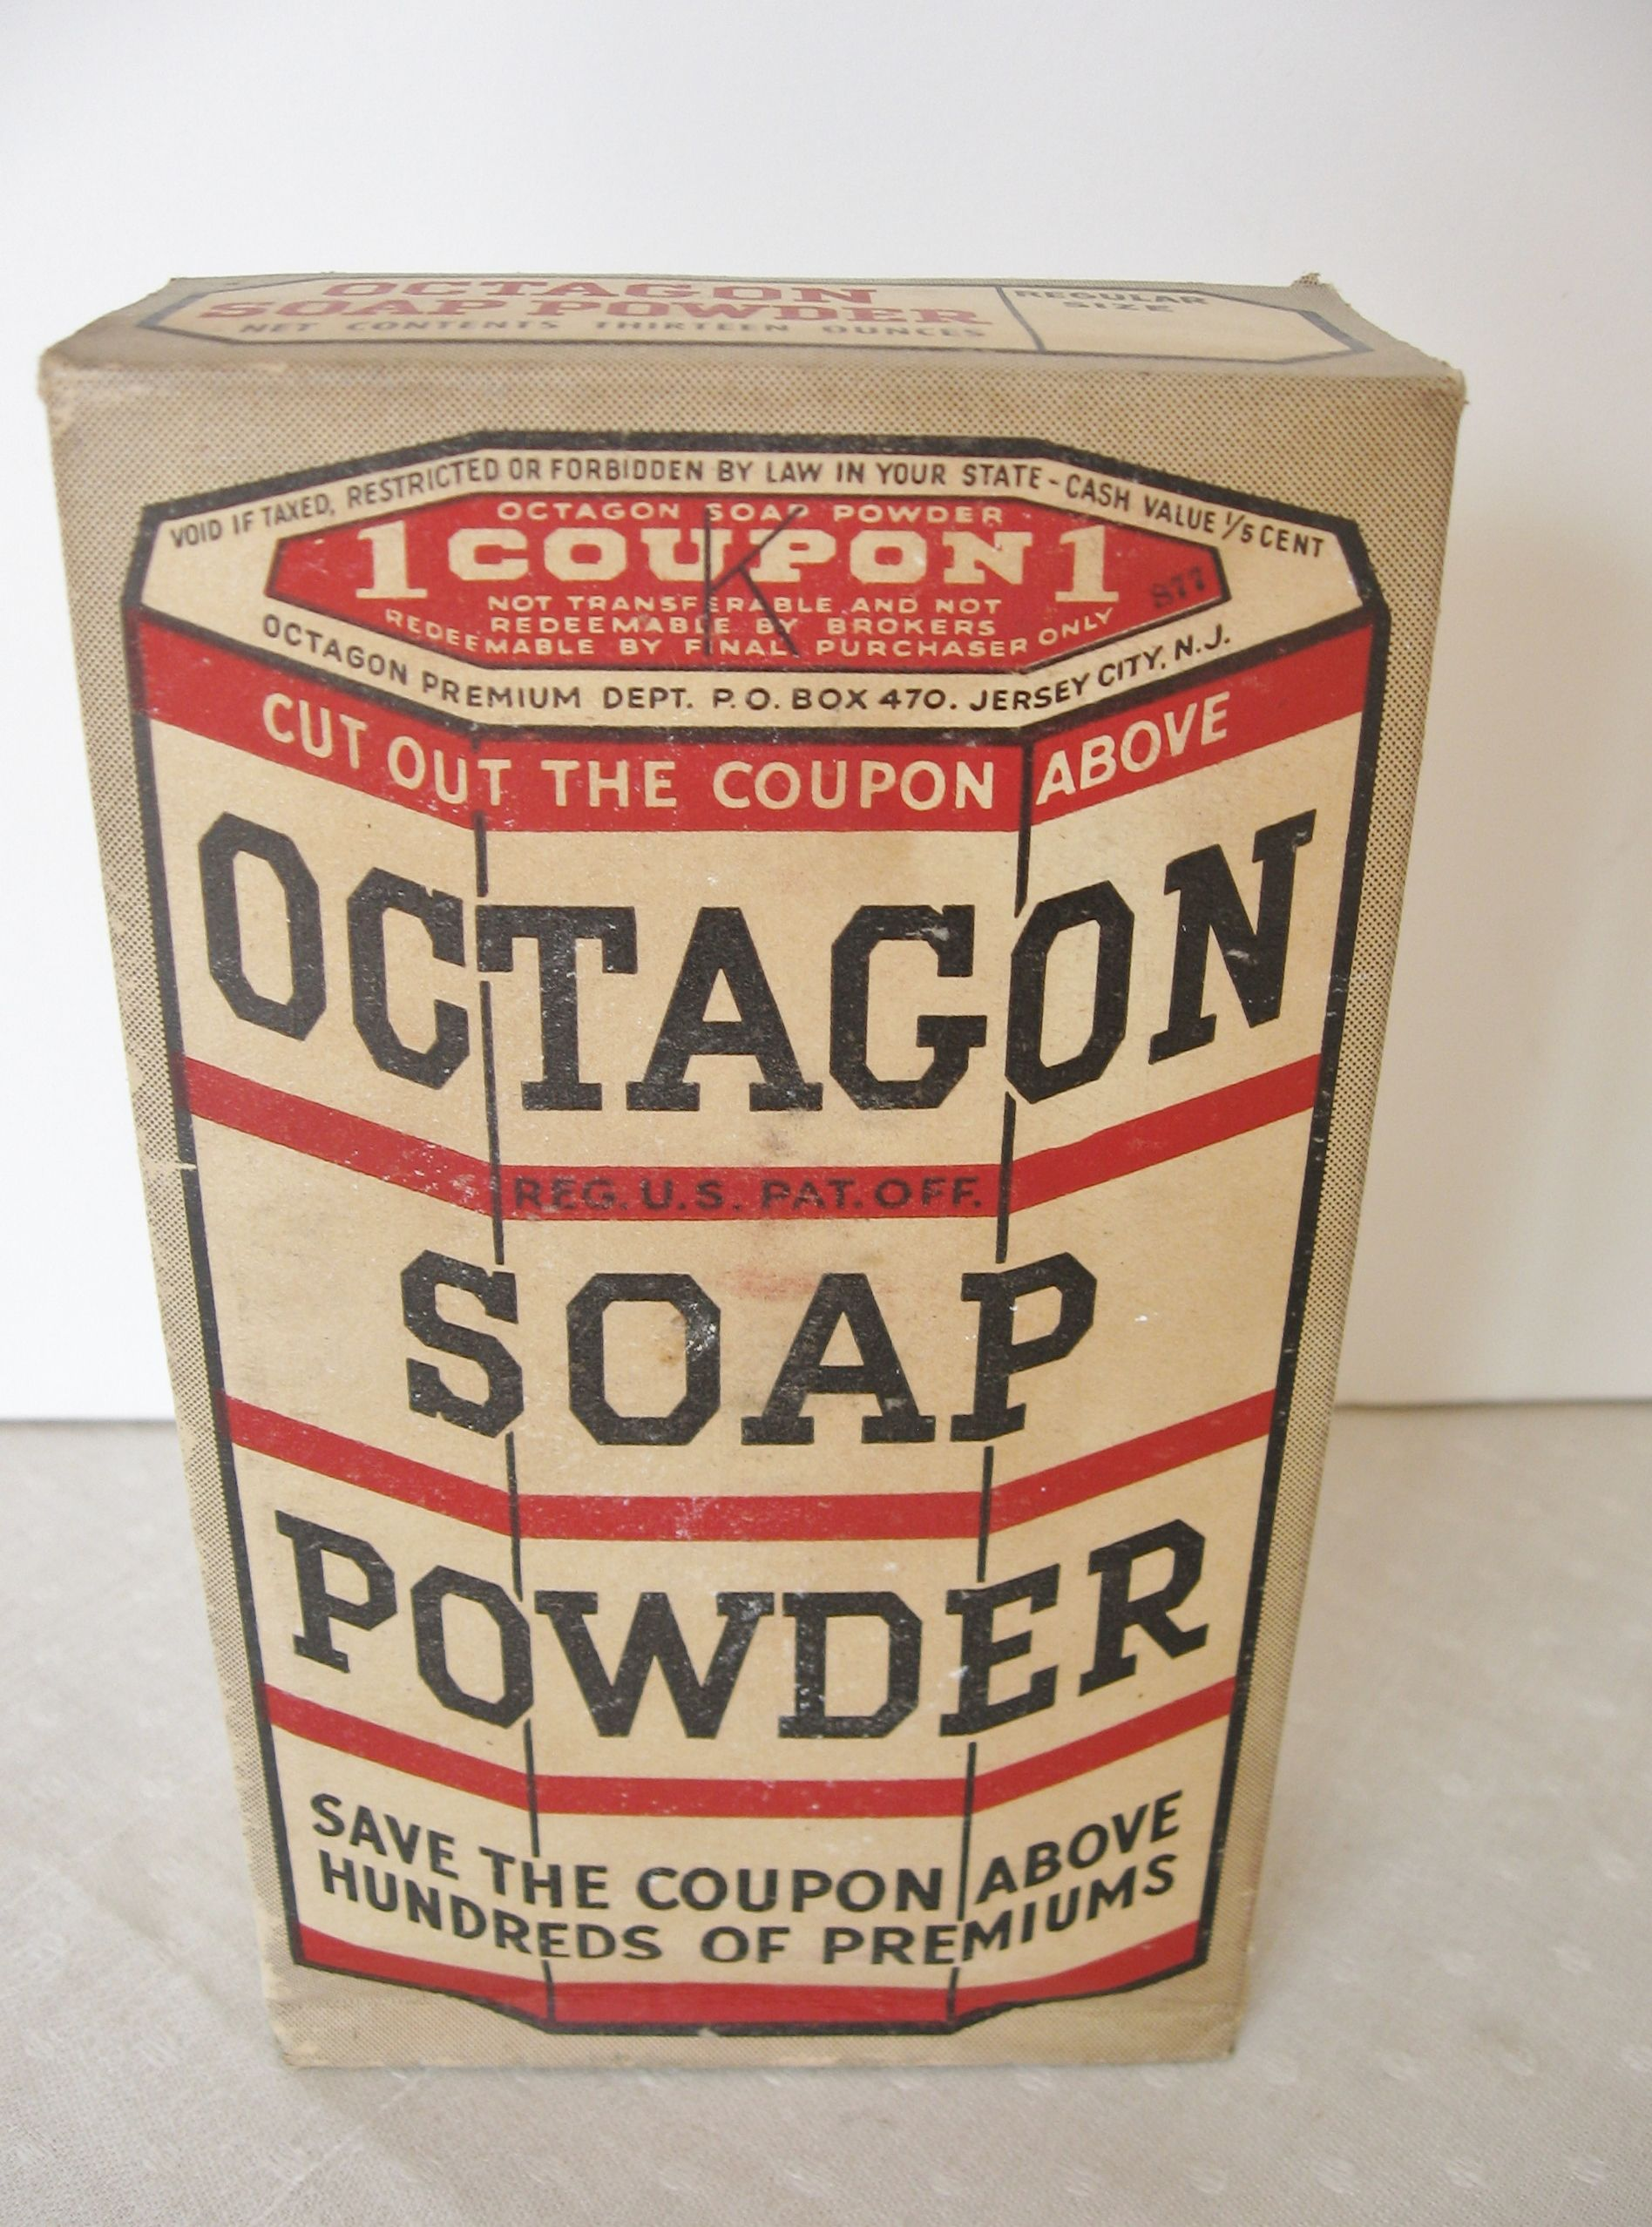 Octagon Octagon Soap Vintage Laundry Vintage Laundry Room